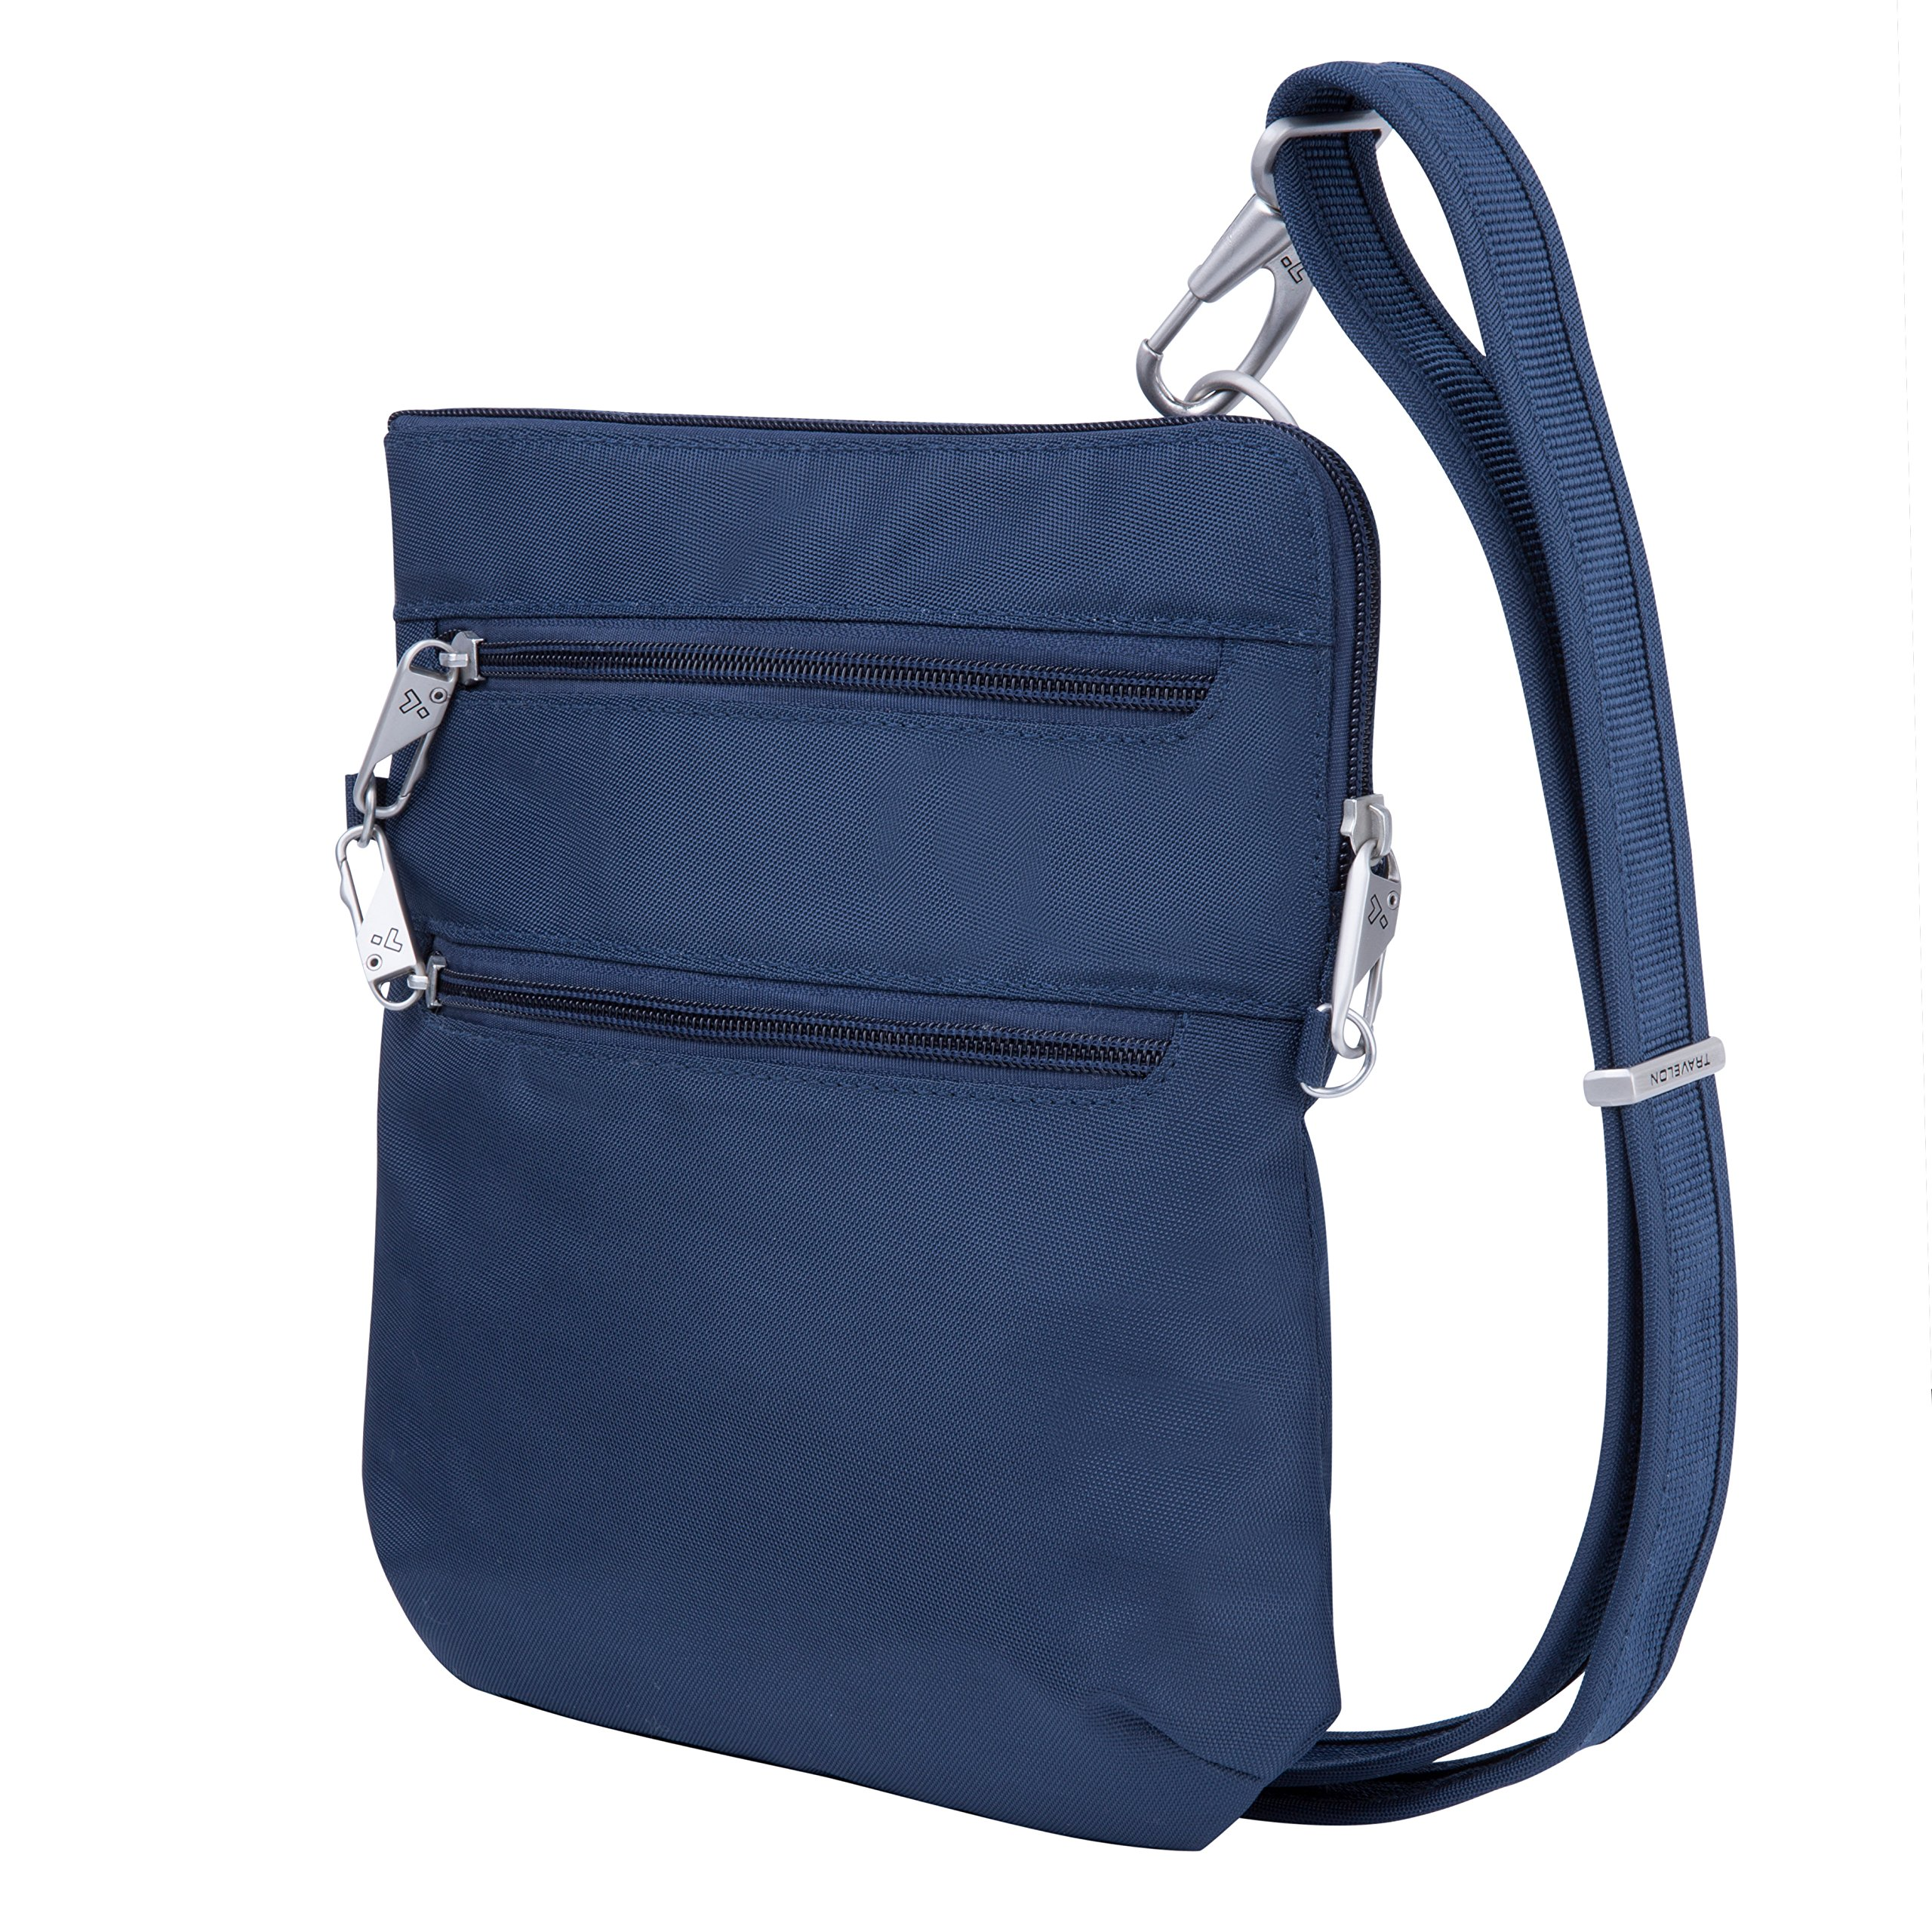 Travelon Anti-Theft Classic Slim Dbl Zip Crossbody Bag, Midnight by Travelon (Image #1)